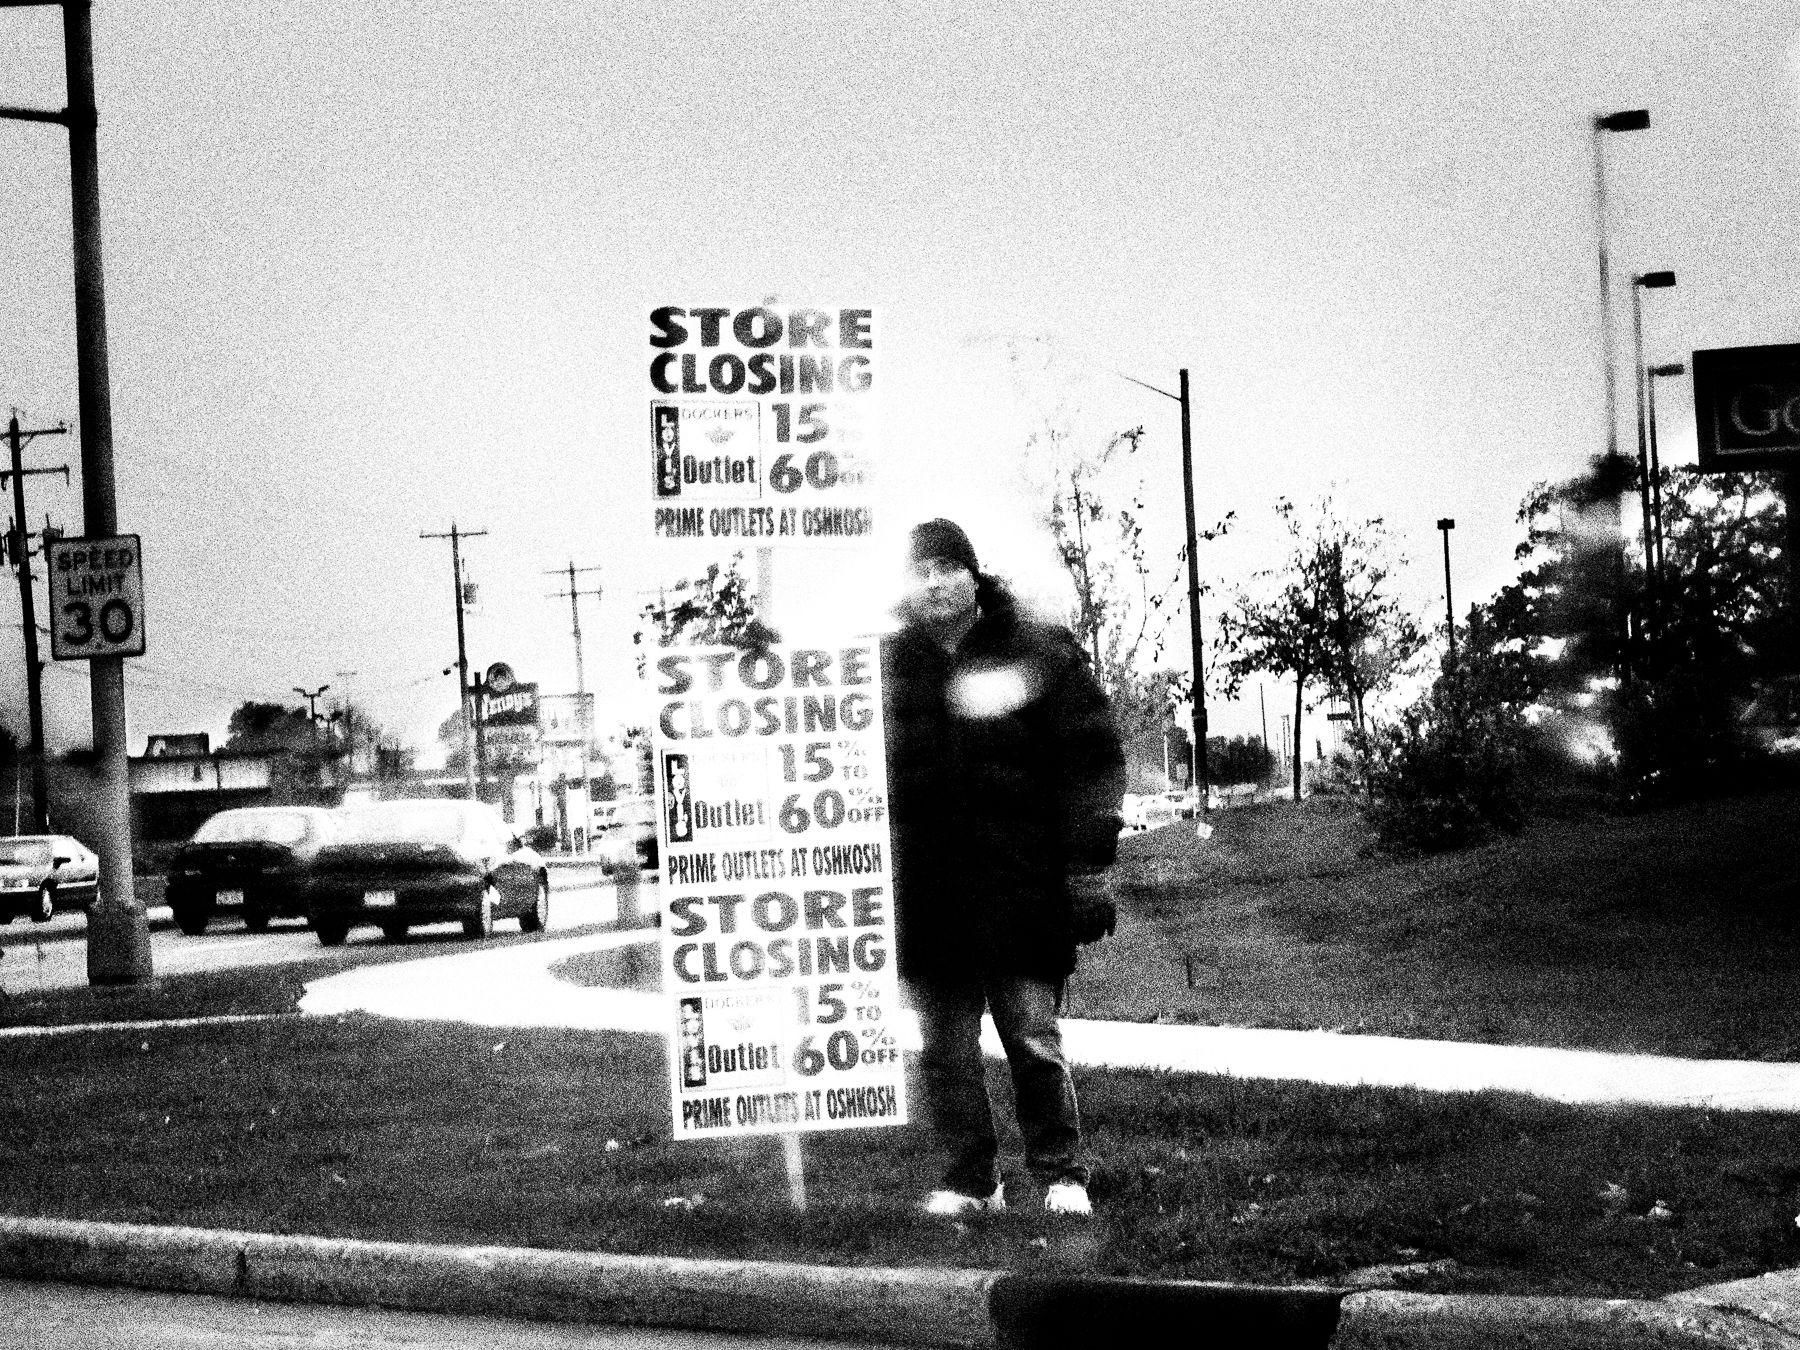 W. South Park Ave., Oshkosh, WI, 2003